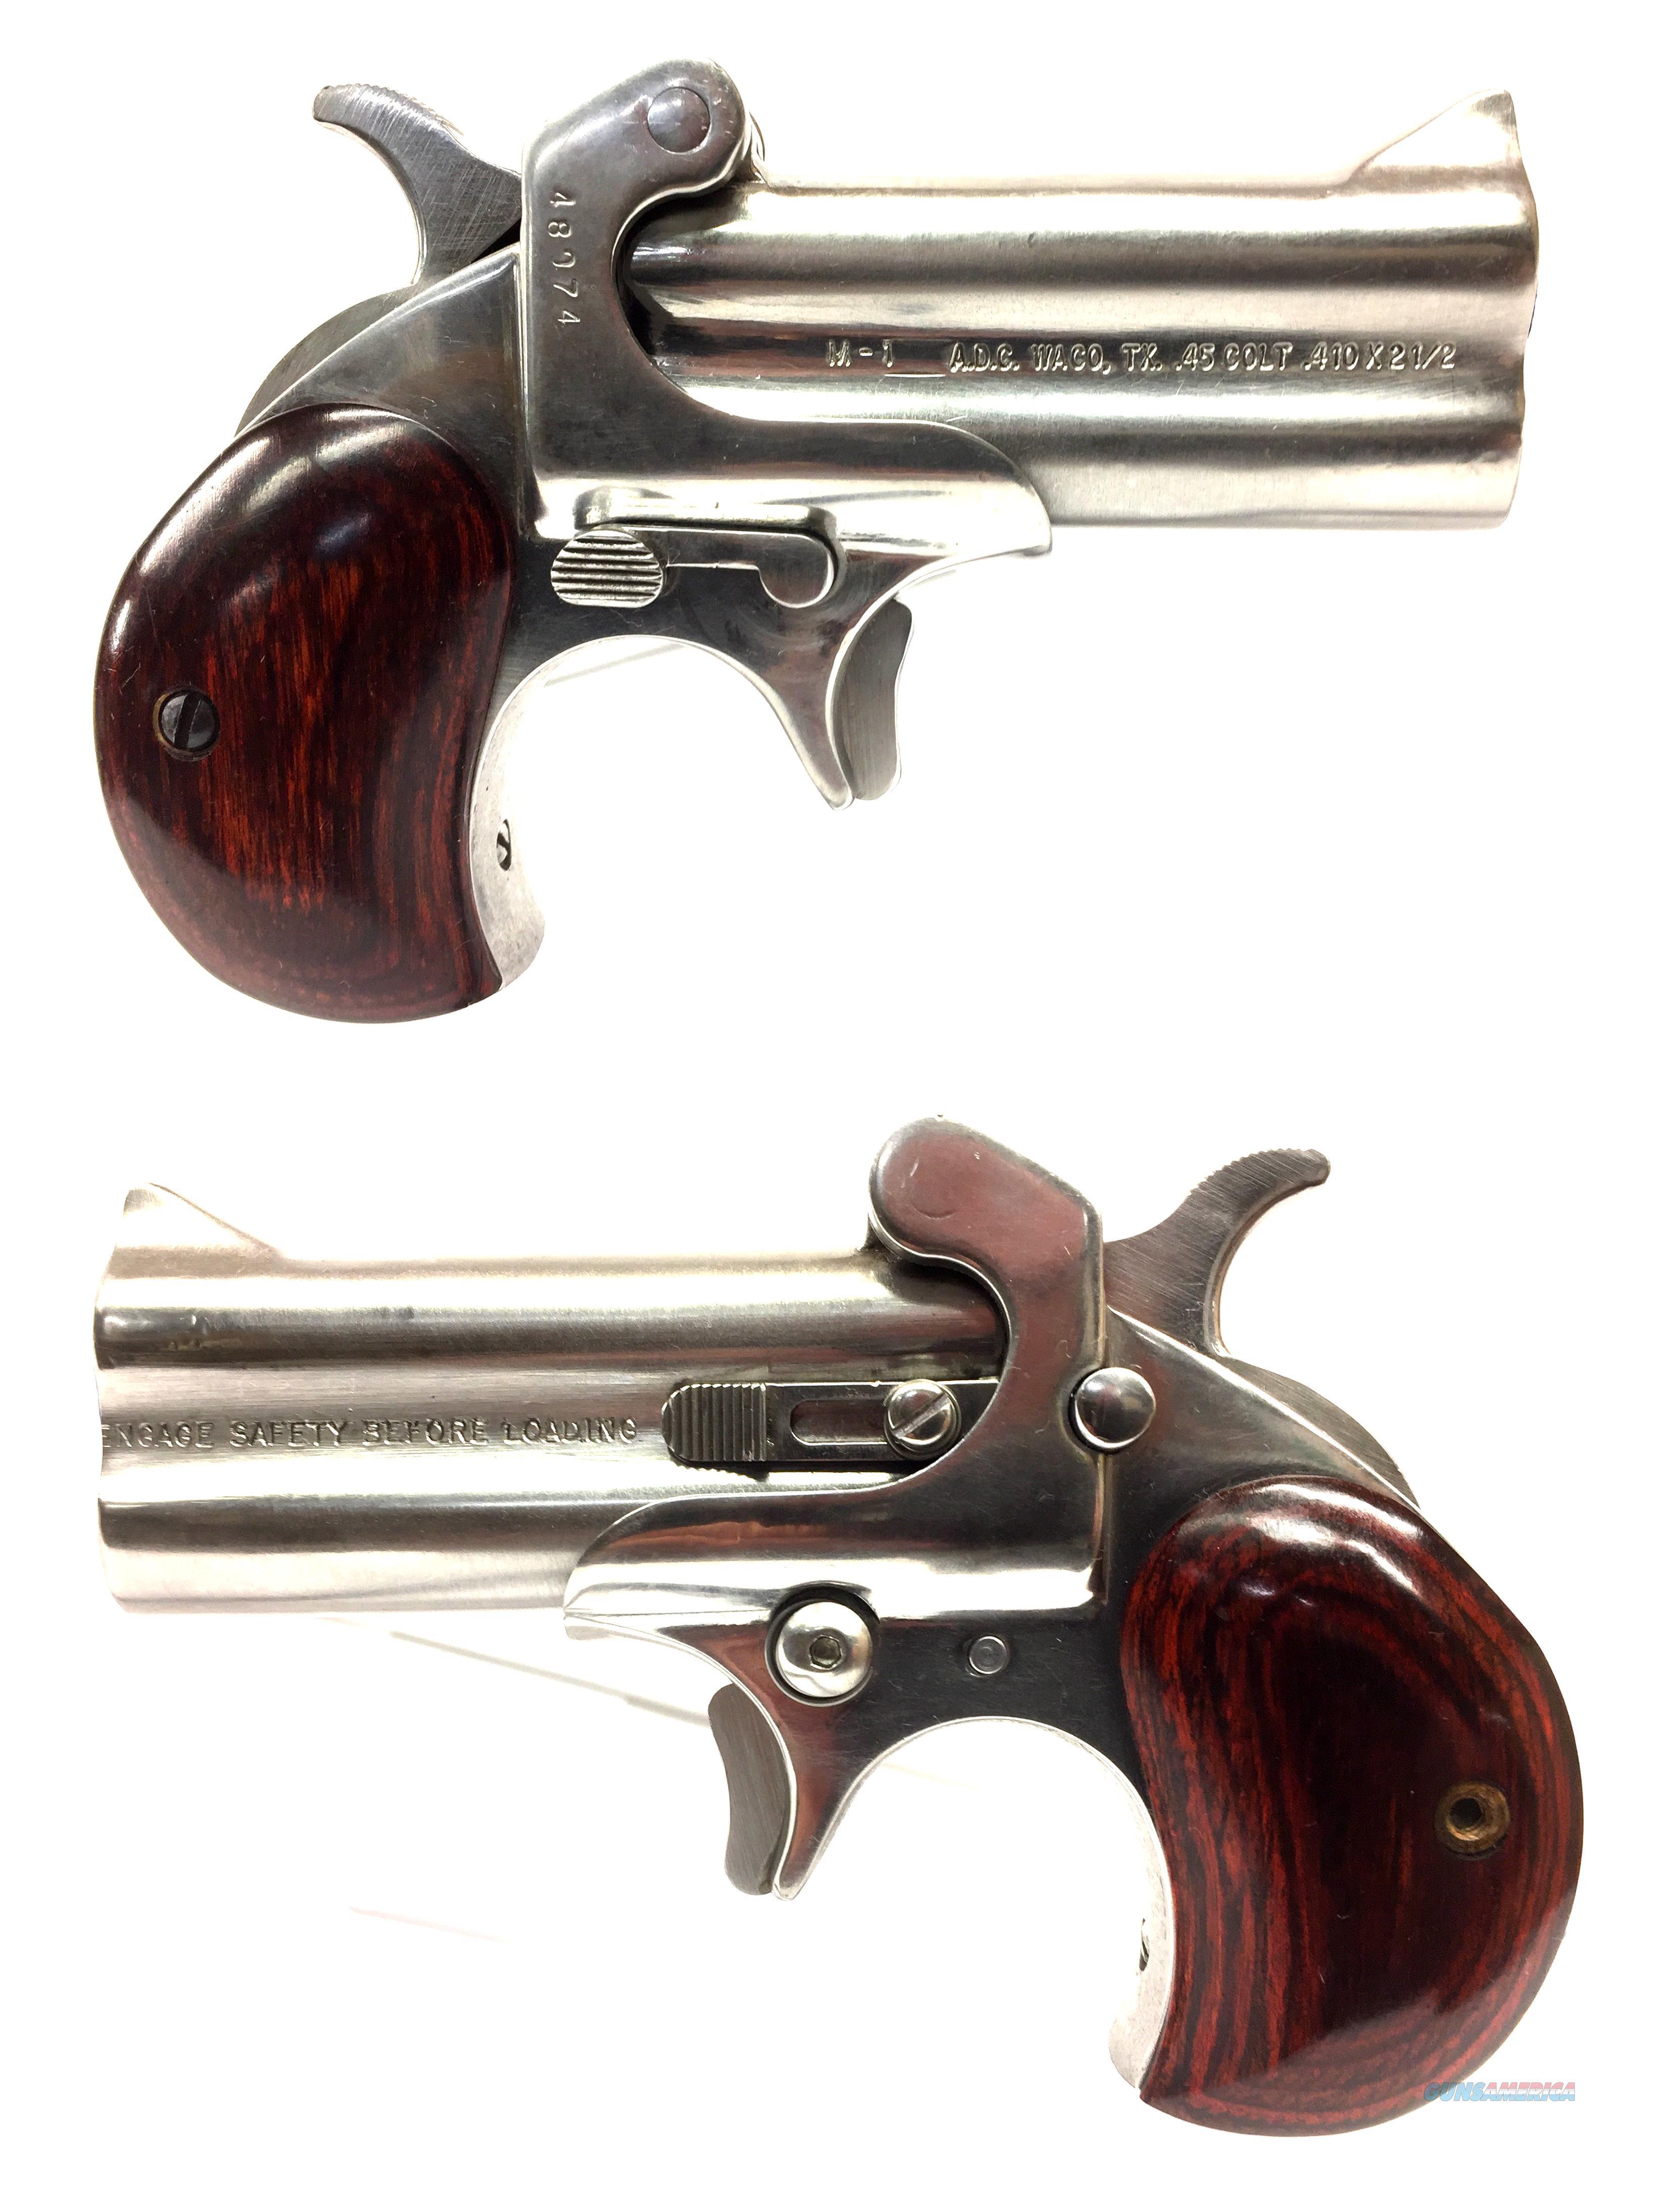 10mm Derringer